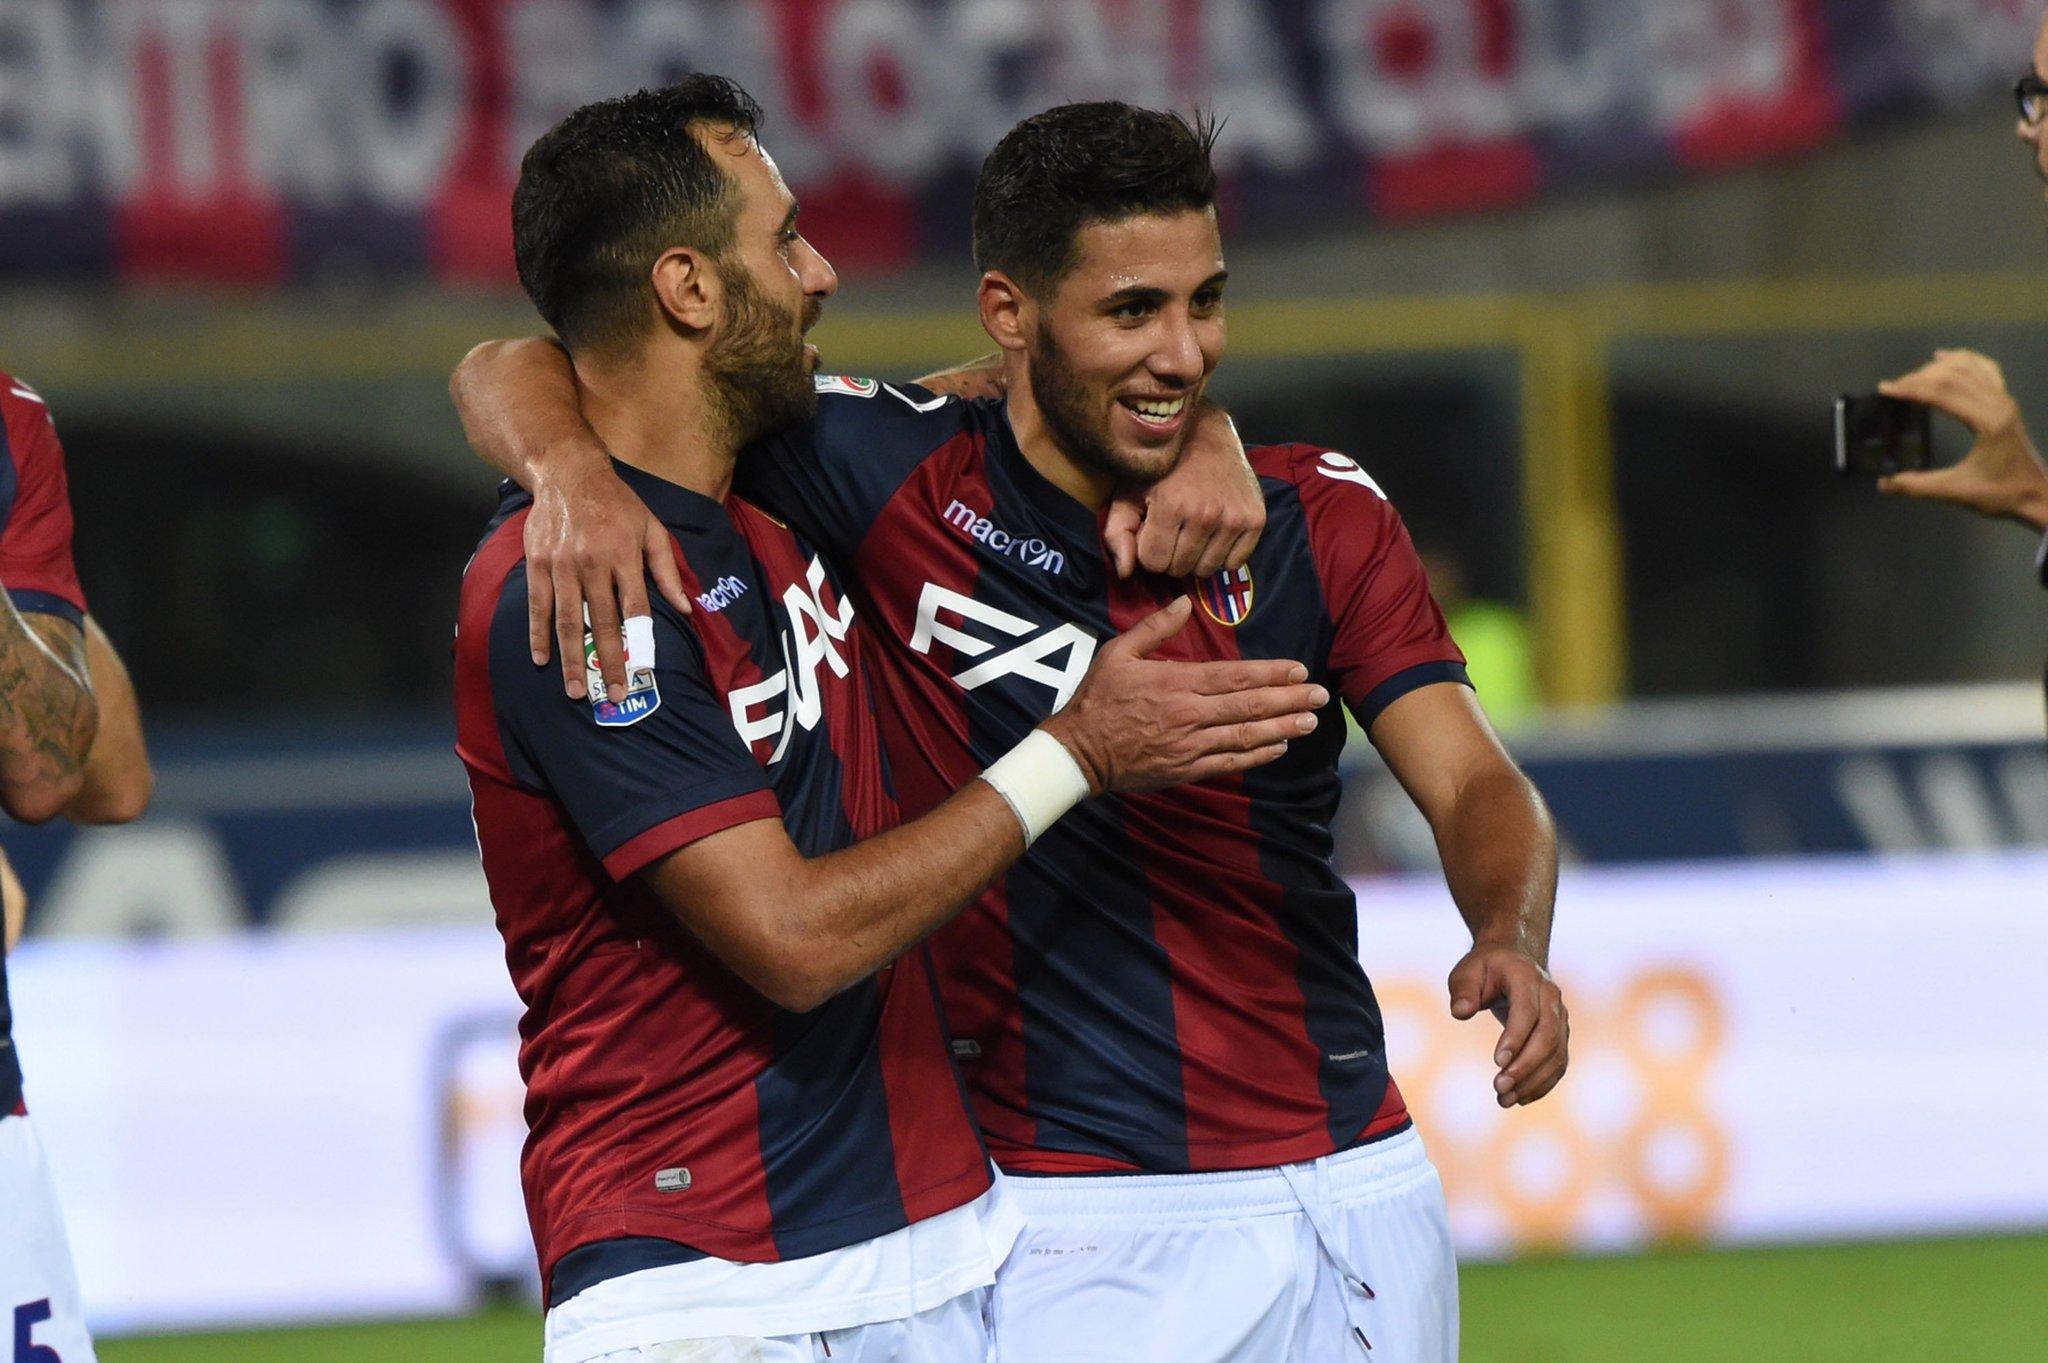 Kia Bologna FC